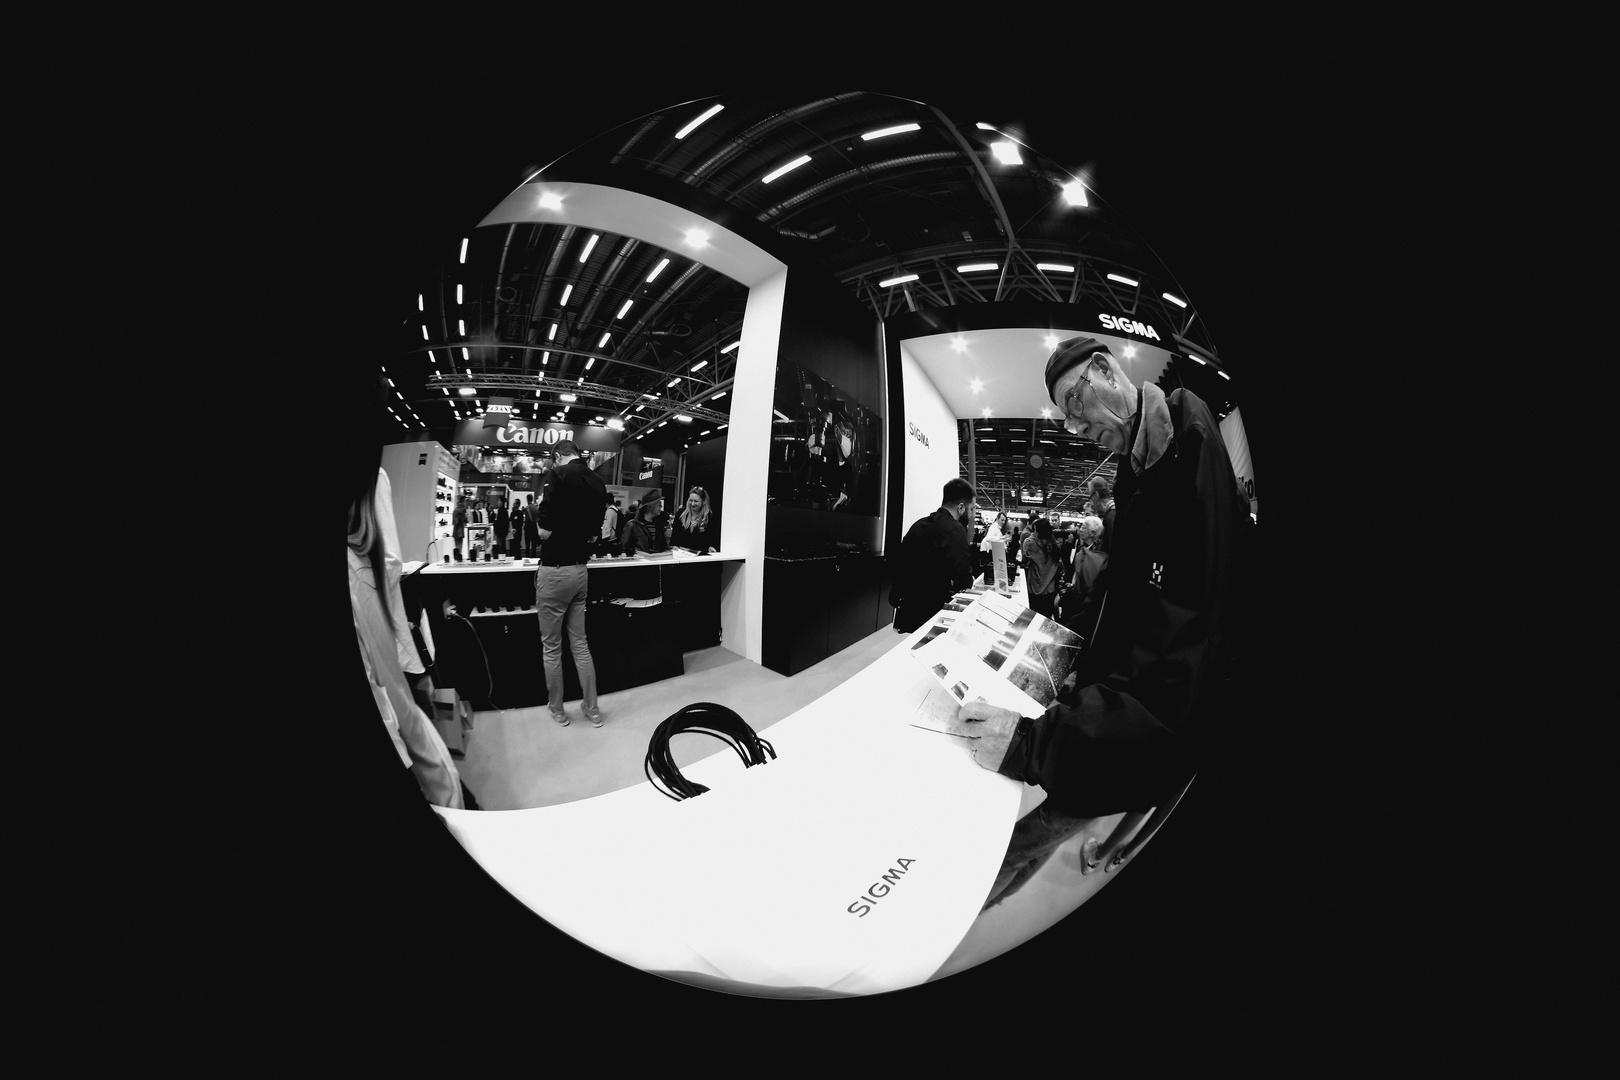 Sigma : 4.5 mm f/2.8 Fisheye circulaire DC EX HSM